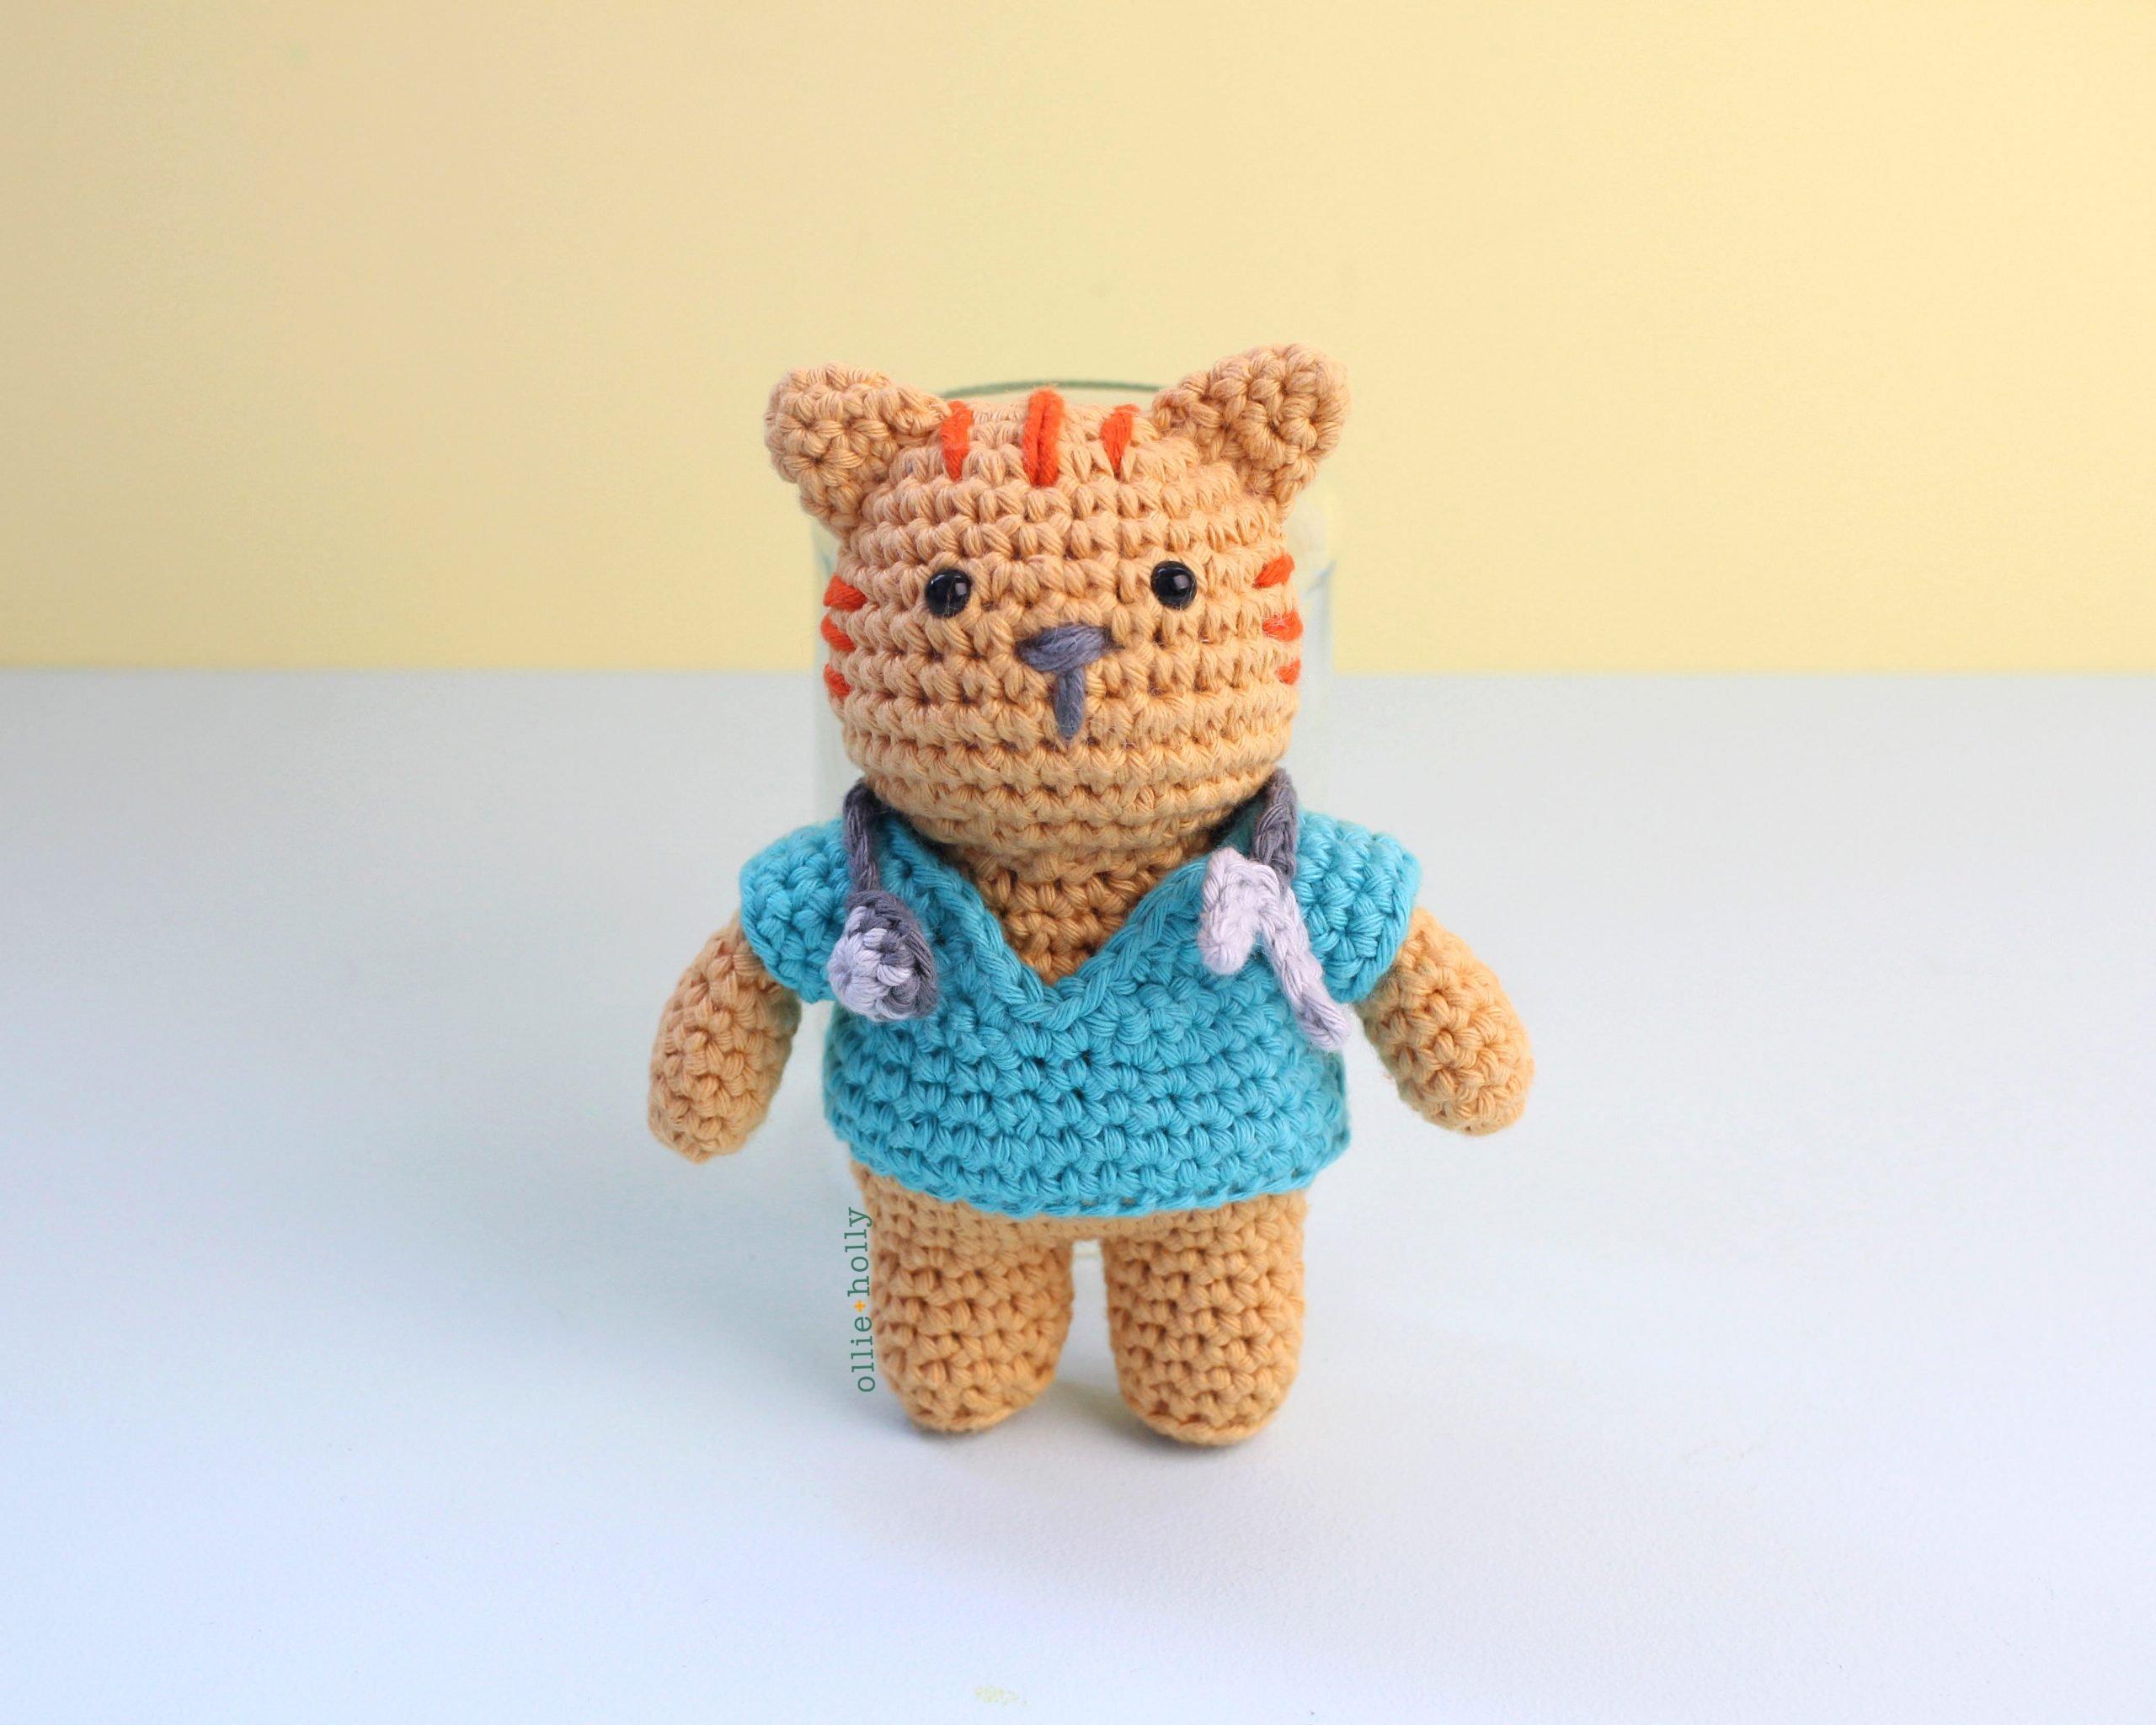 Free Nurse Cat Stuffed Animal Amigurumi Crochet Pattern Complete